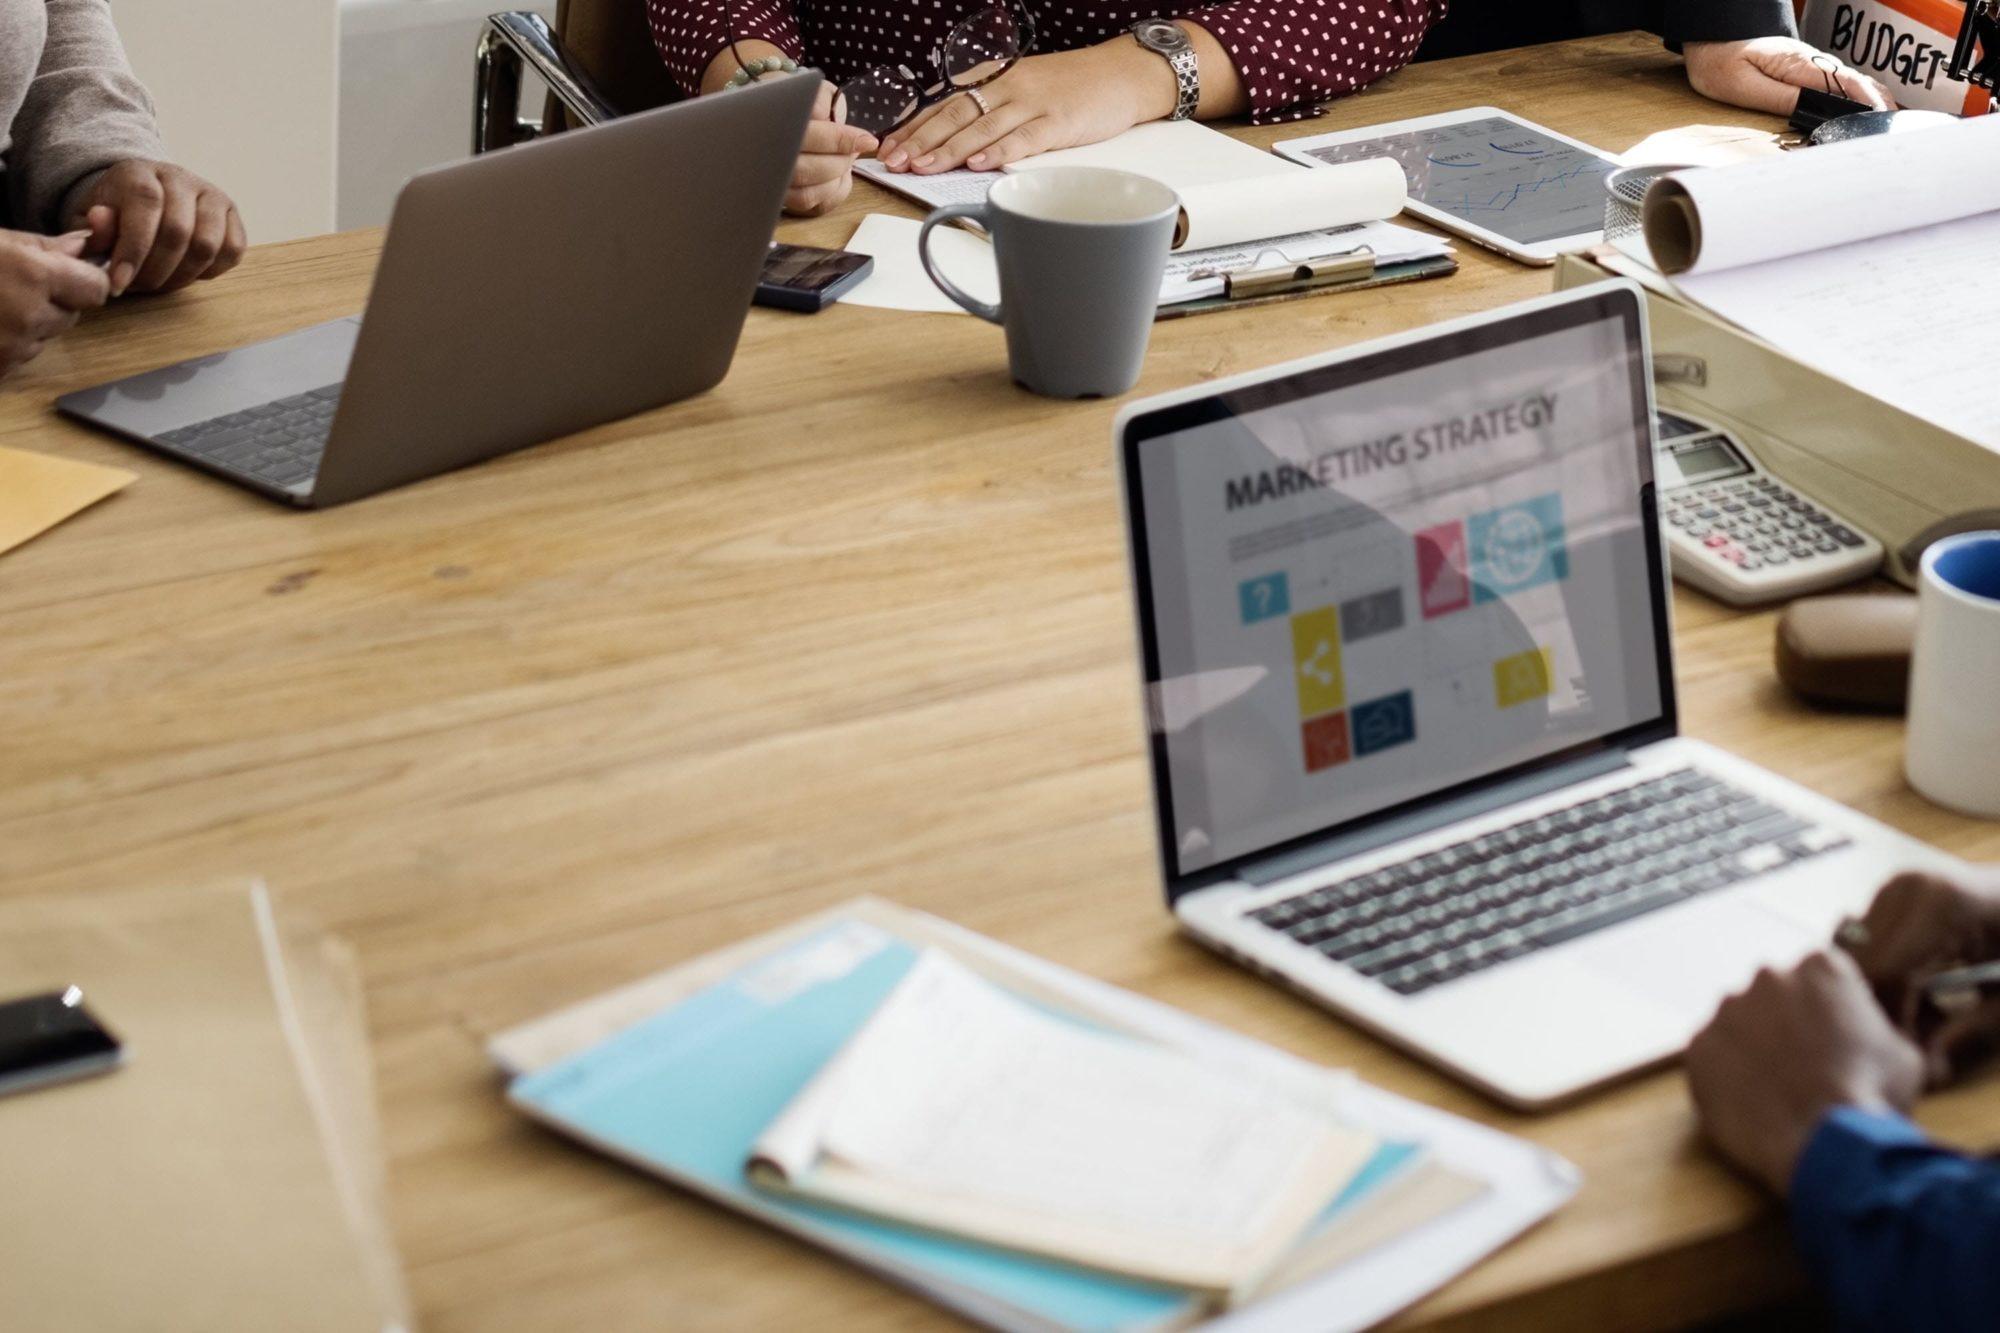 Offline vs. Online marketing mediums for small businesses.